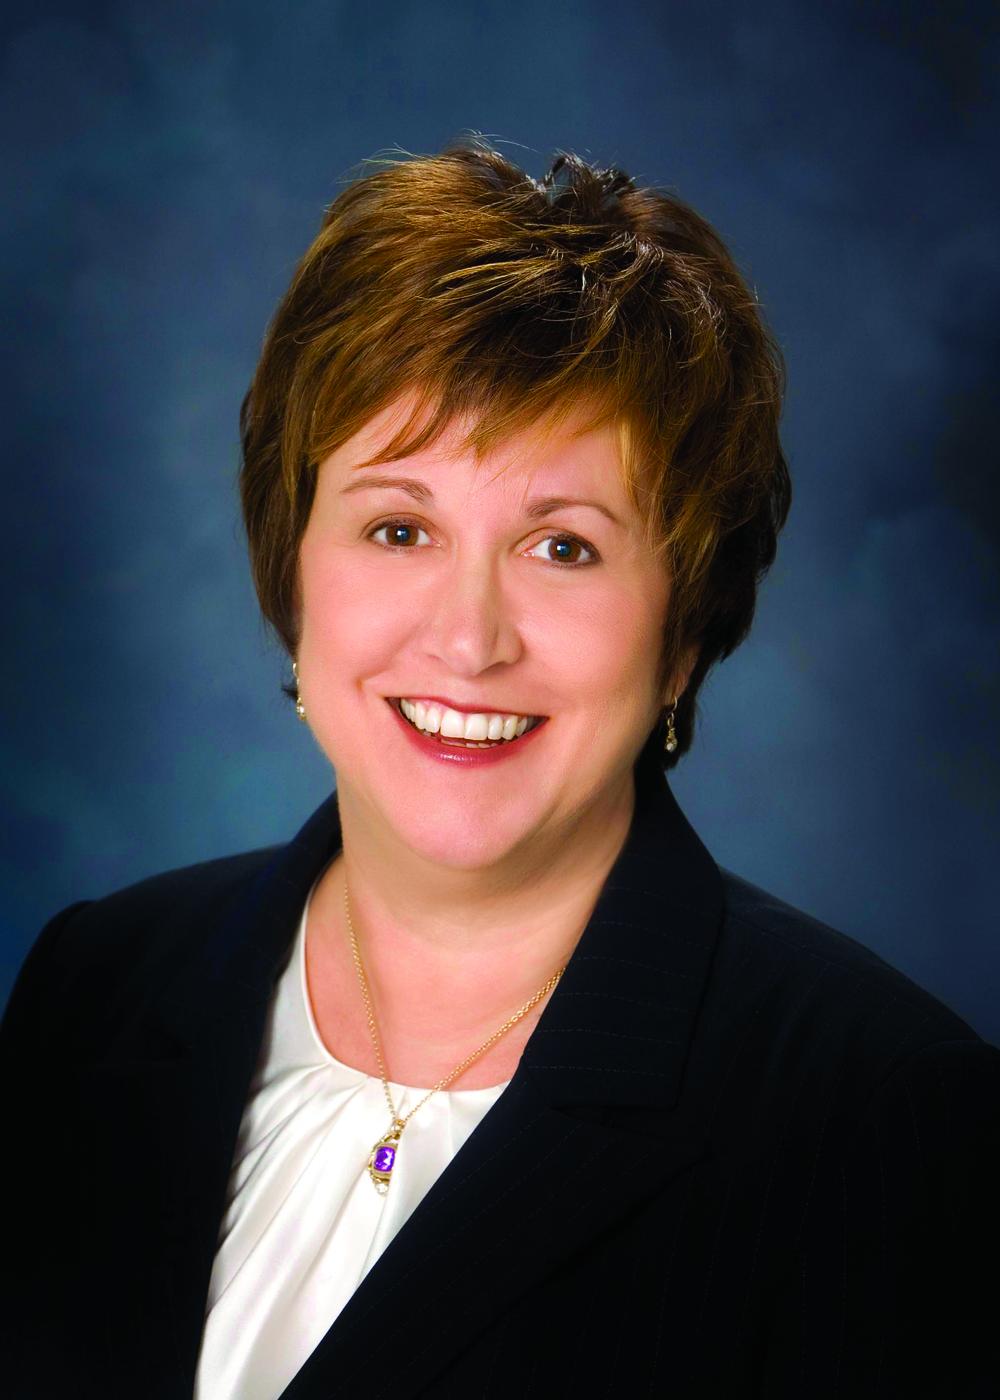 Dr. Debra Pellegrino